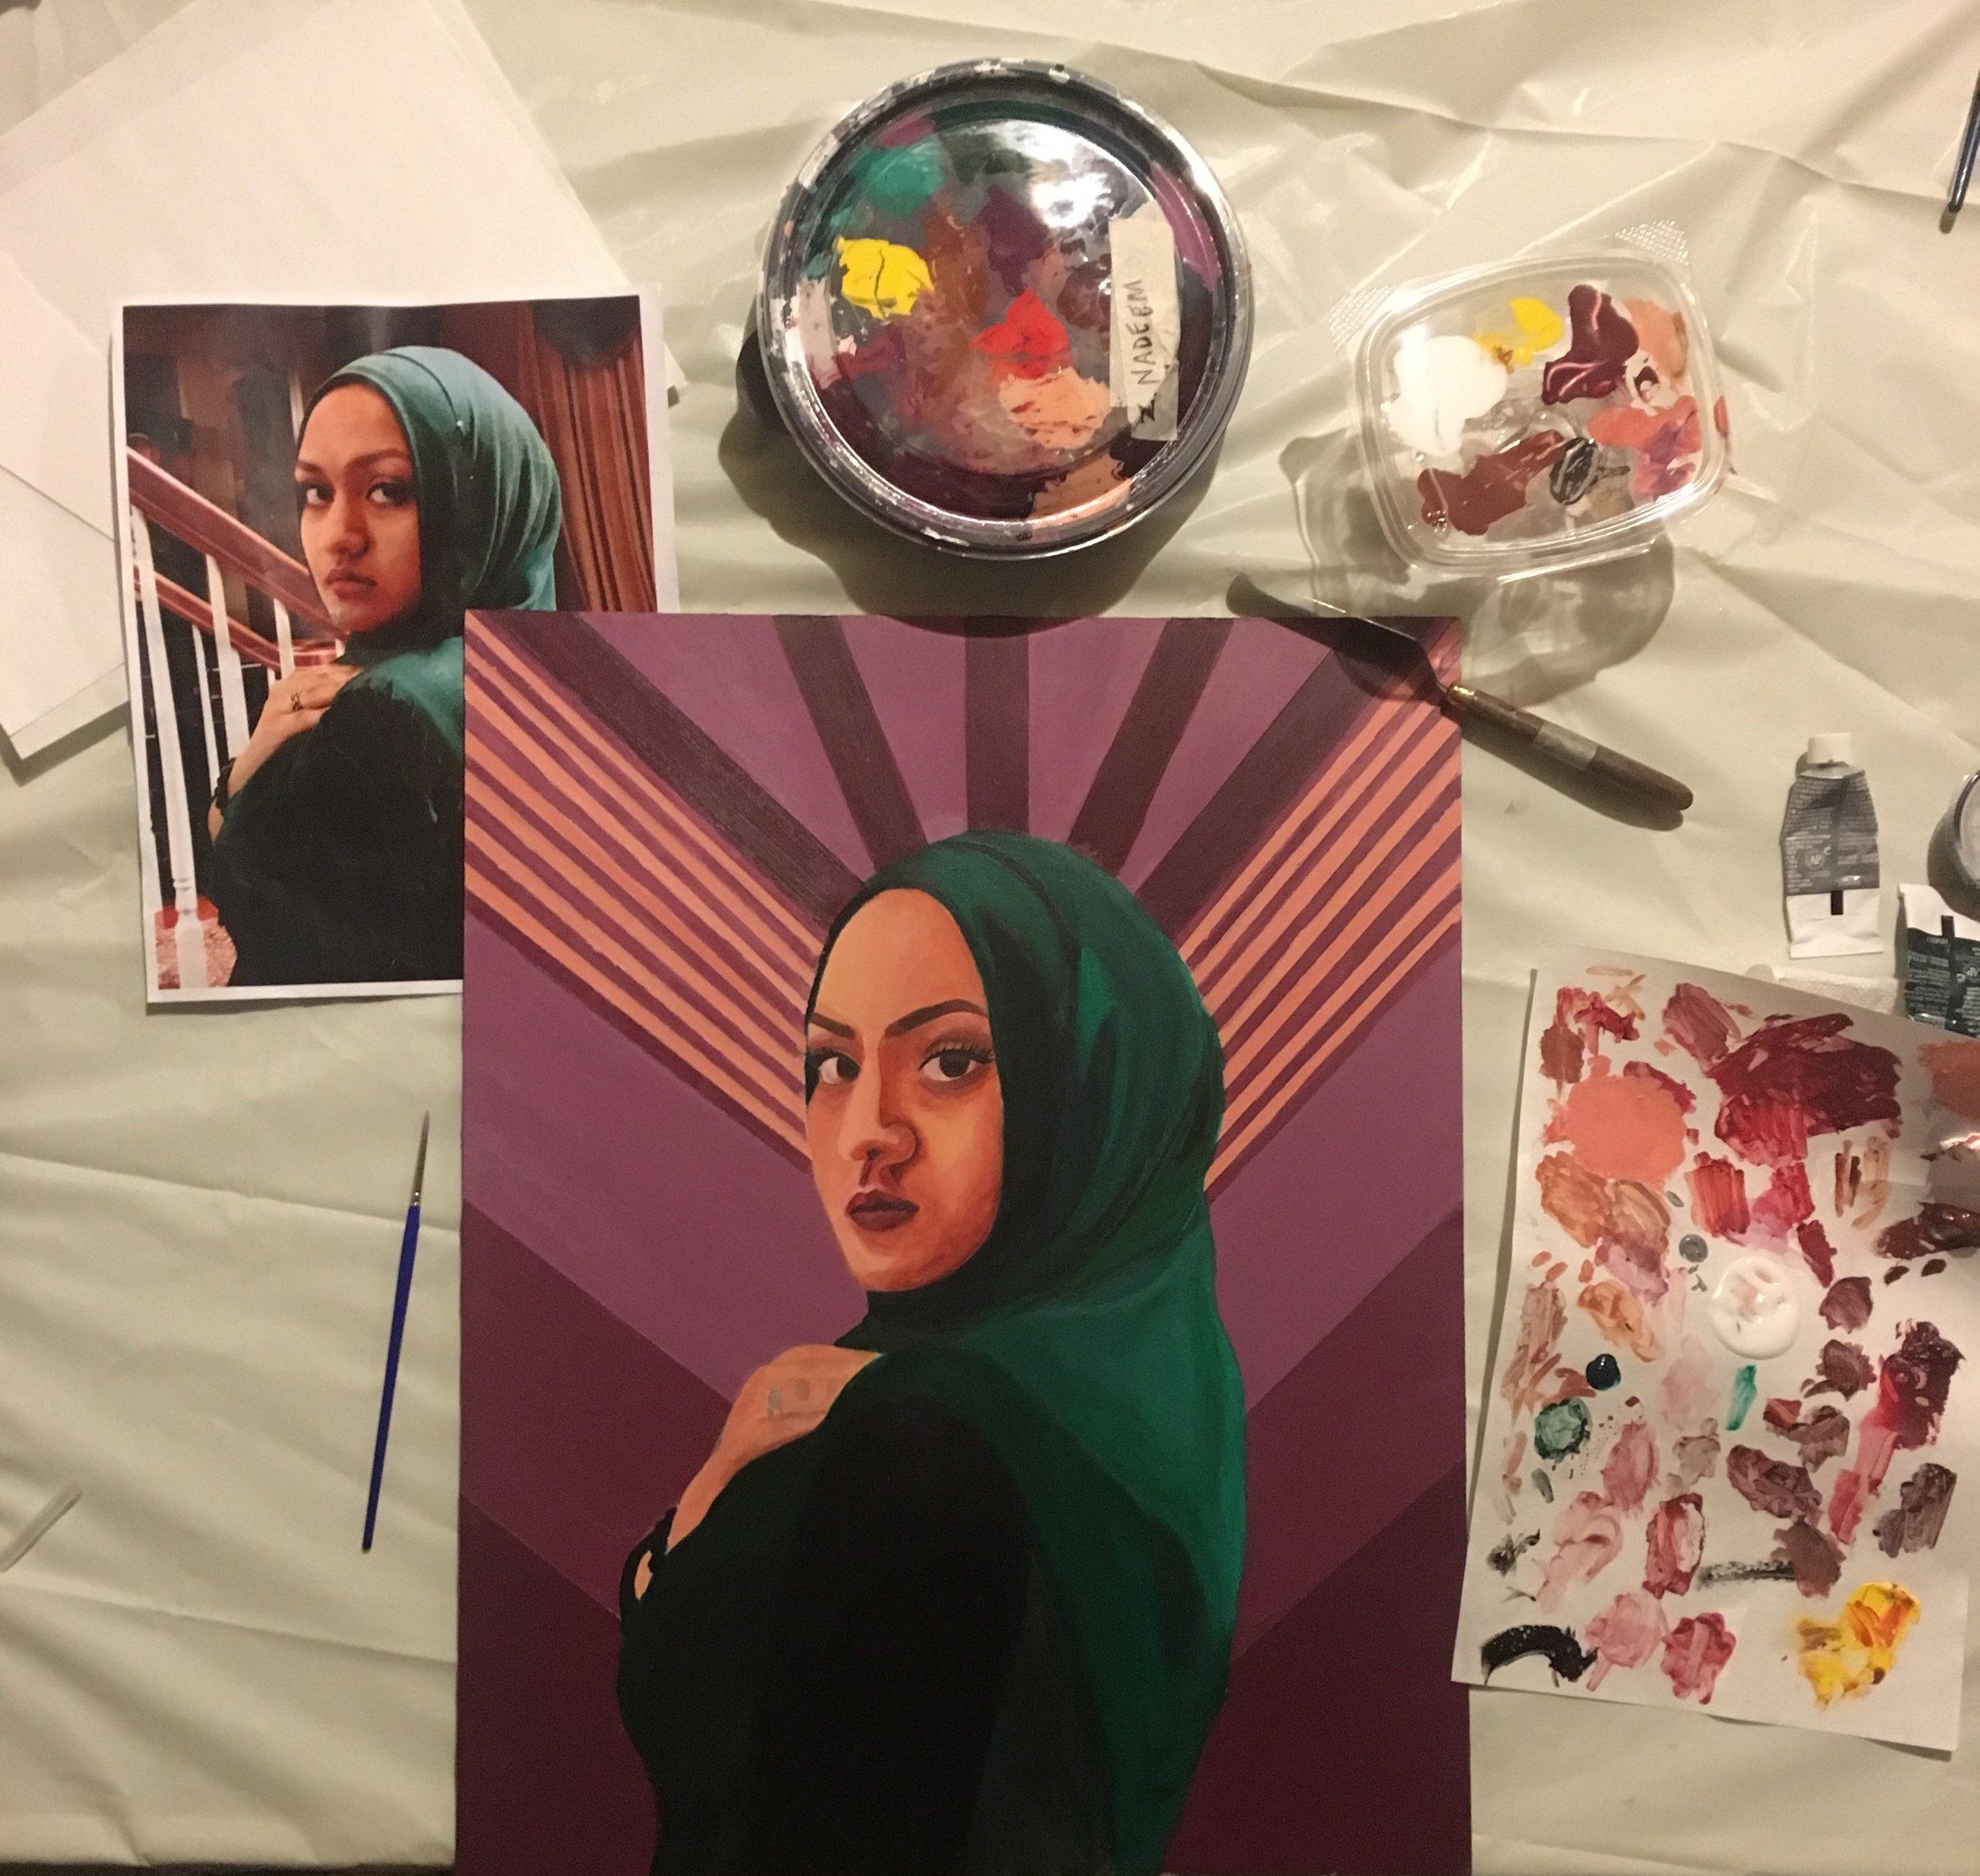 Medium: Acrylic Paint